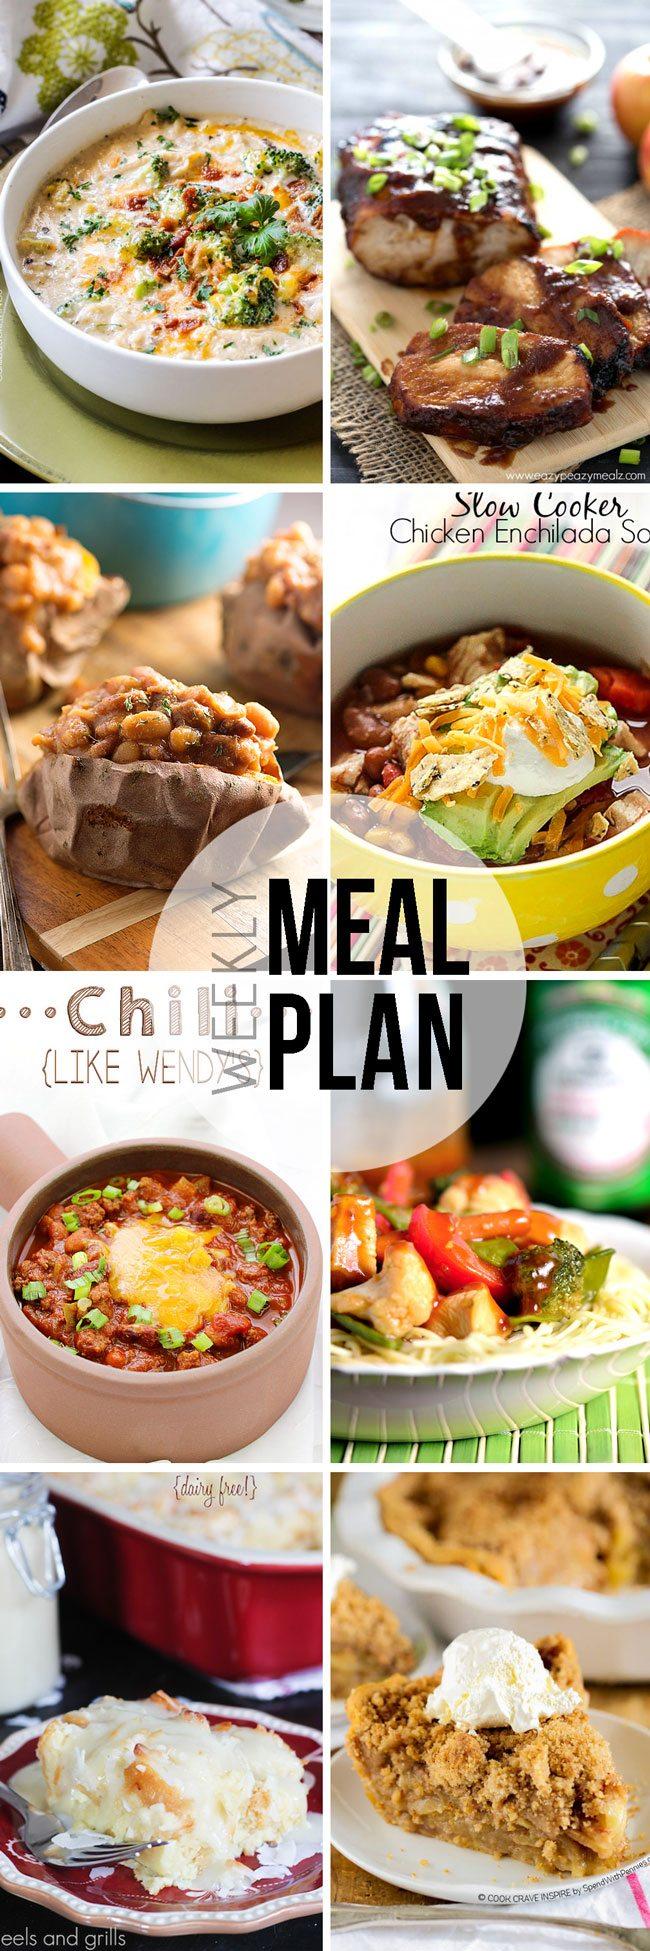 Meal-Plan---Pinterest-31